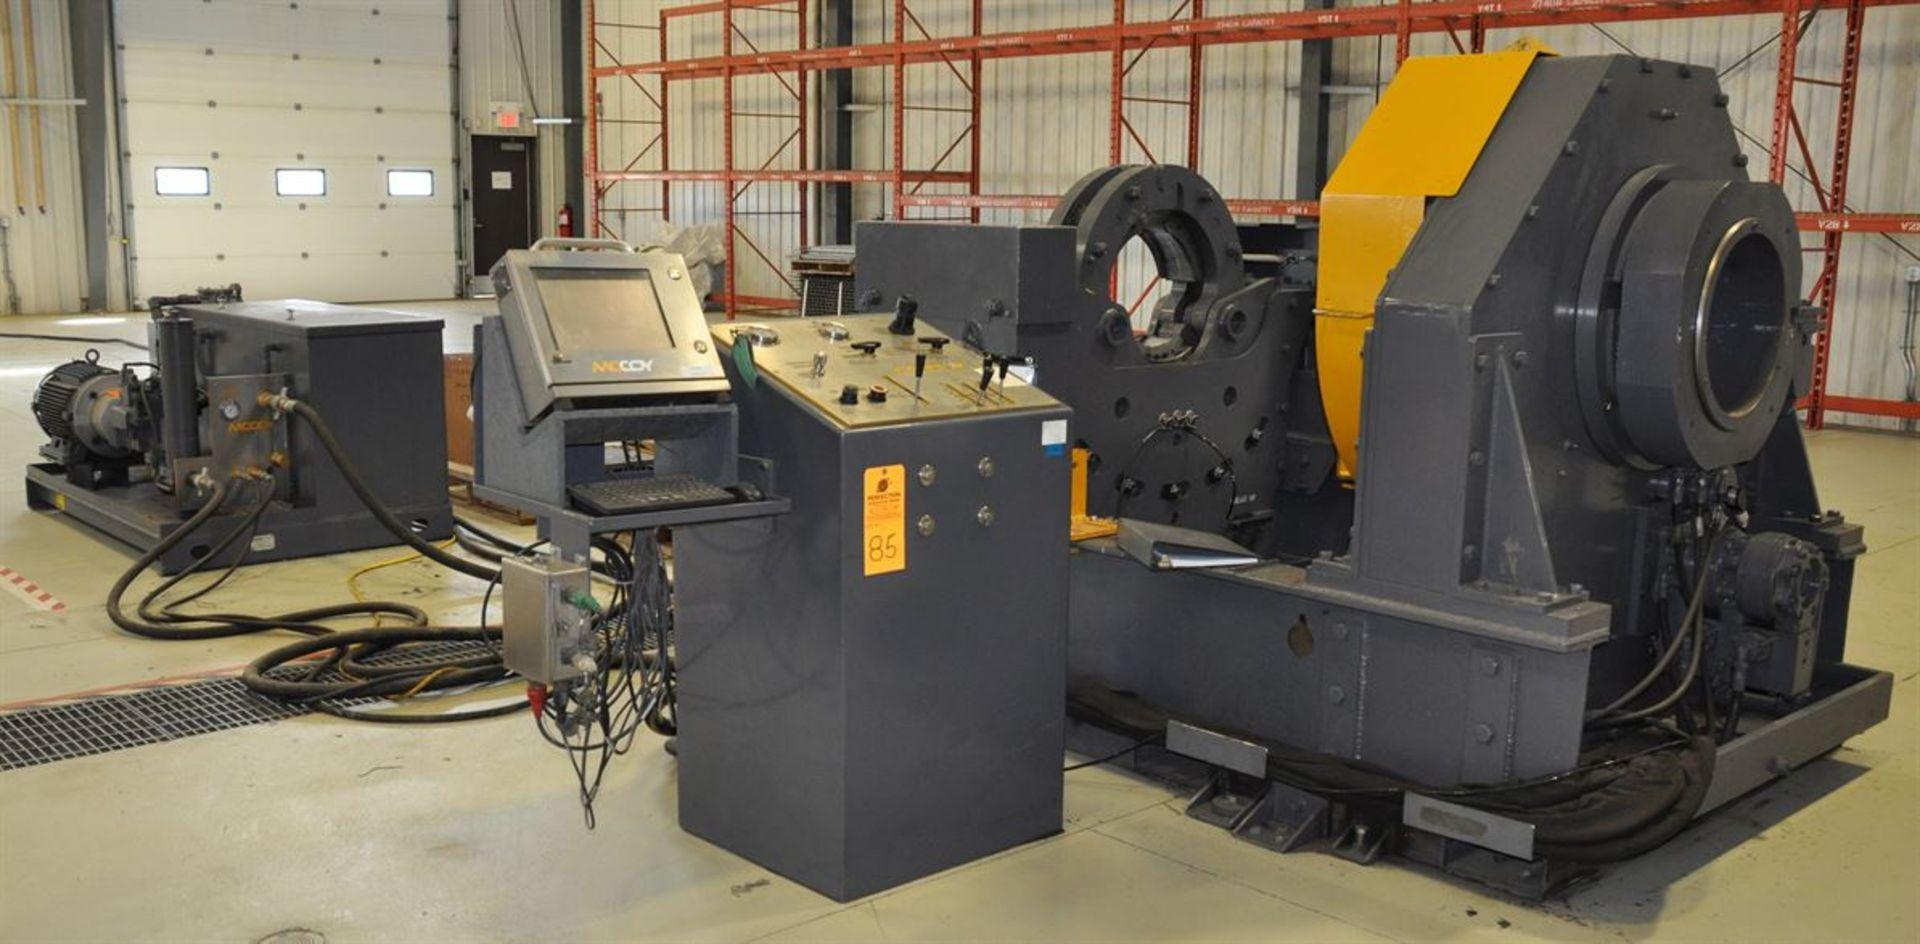 "2012 McCOY CLEBU 1500 15"" Type III Bucking Unit, s/n 8988, w/ PLC Control, Size Range: 15"" – 2."